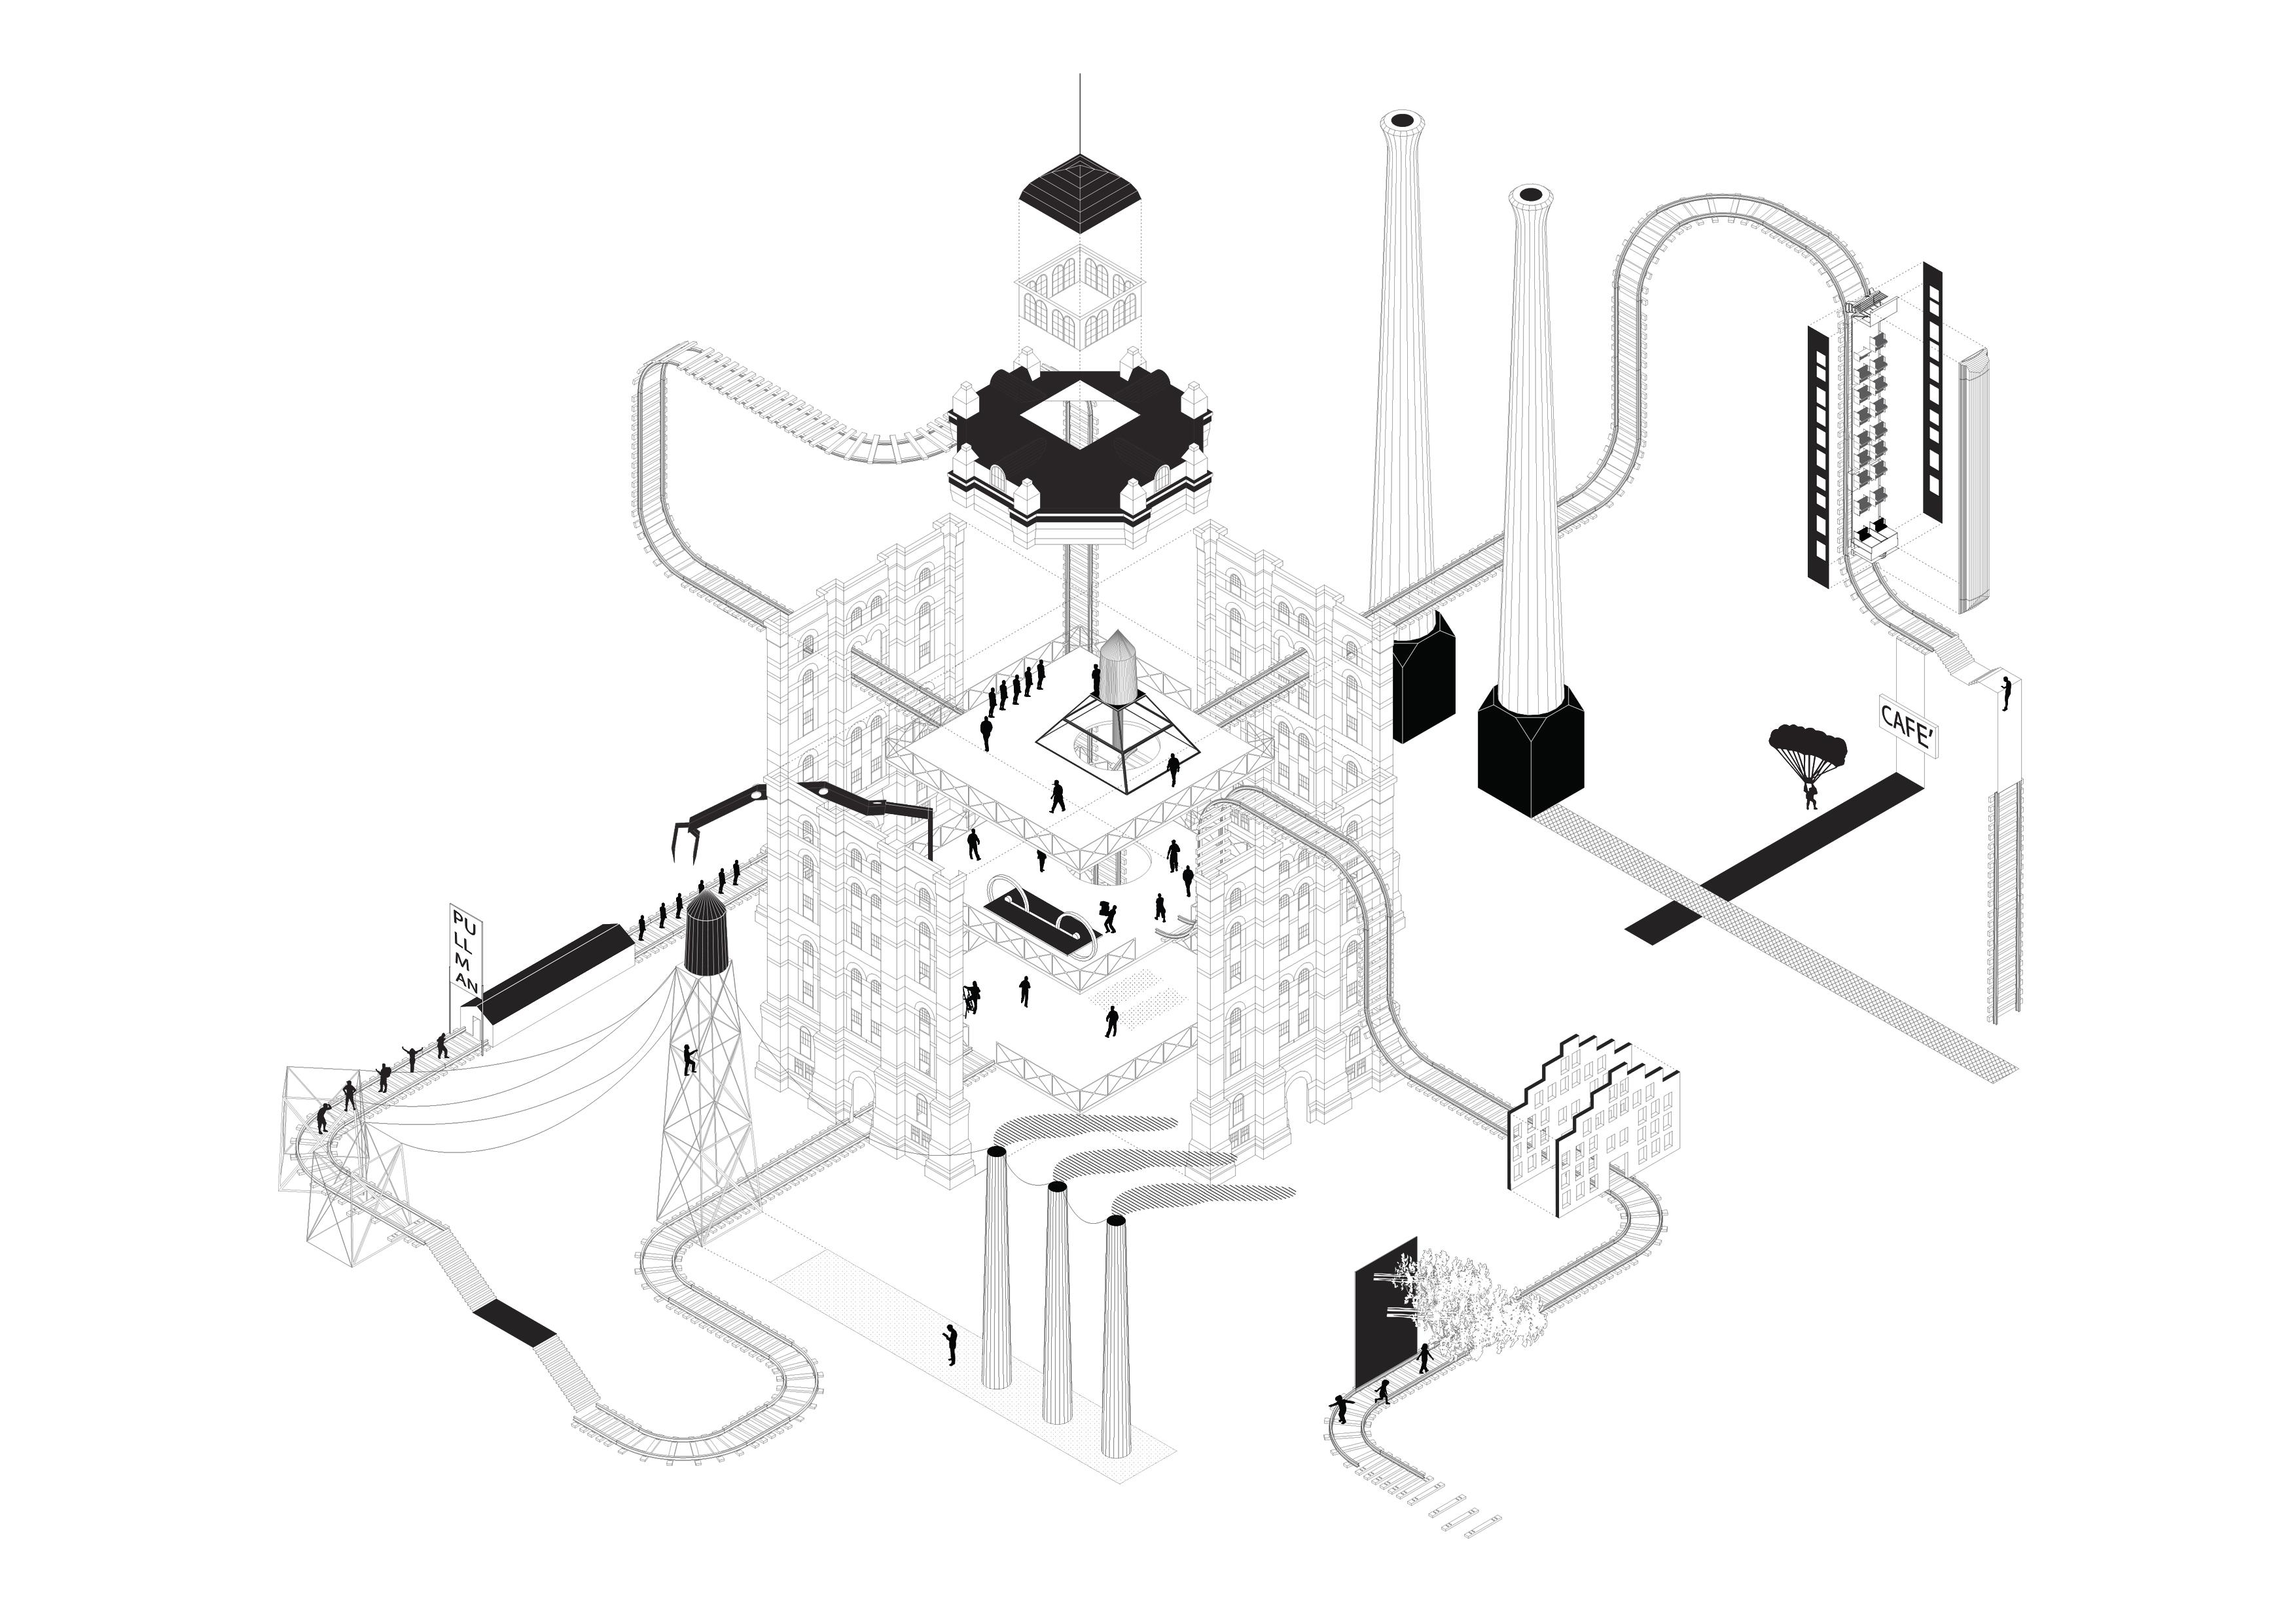 The Corporate City_Architecture of control_Axonometric diagram